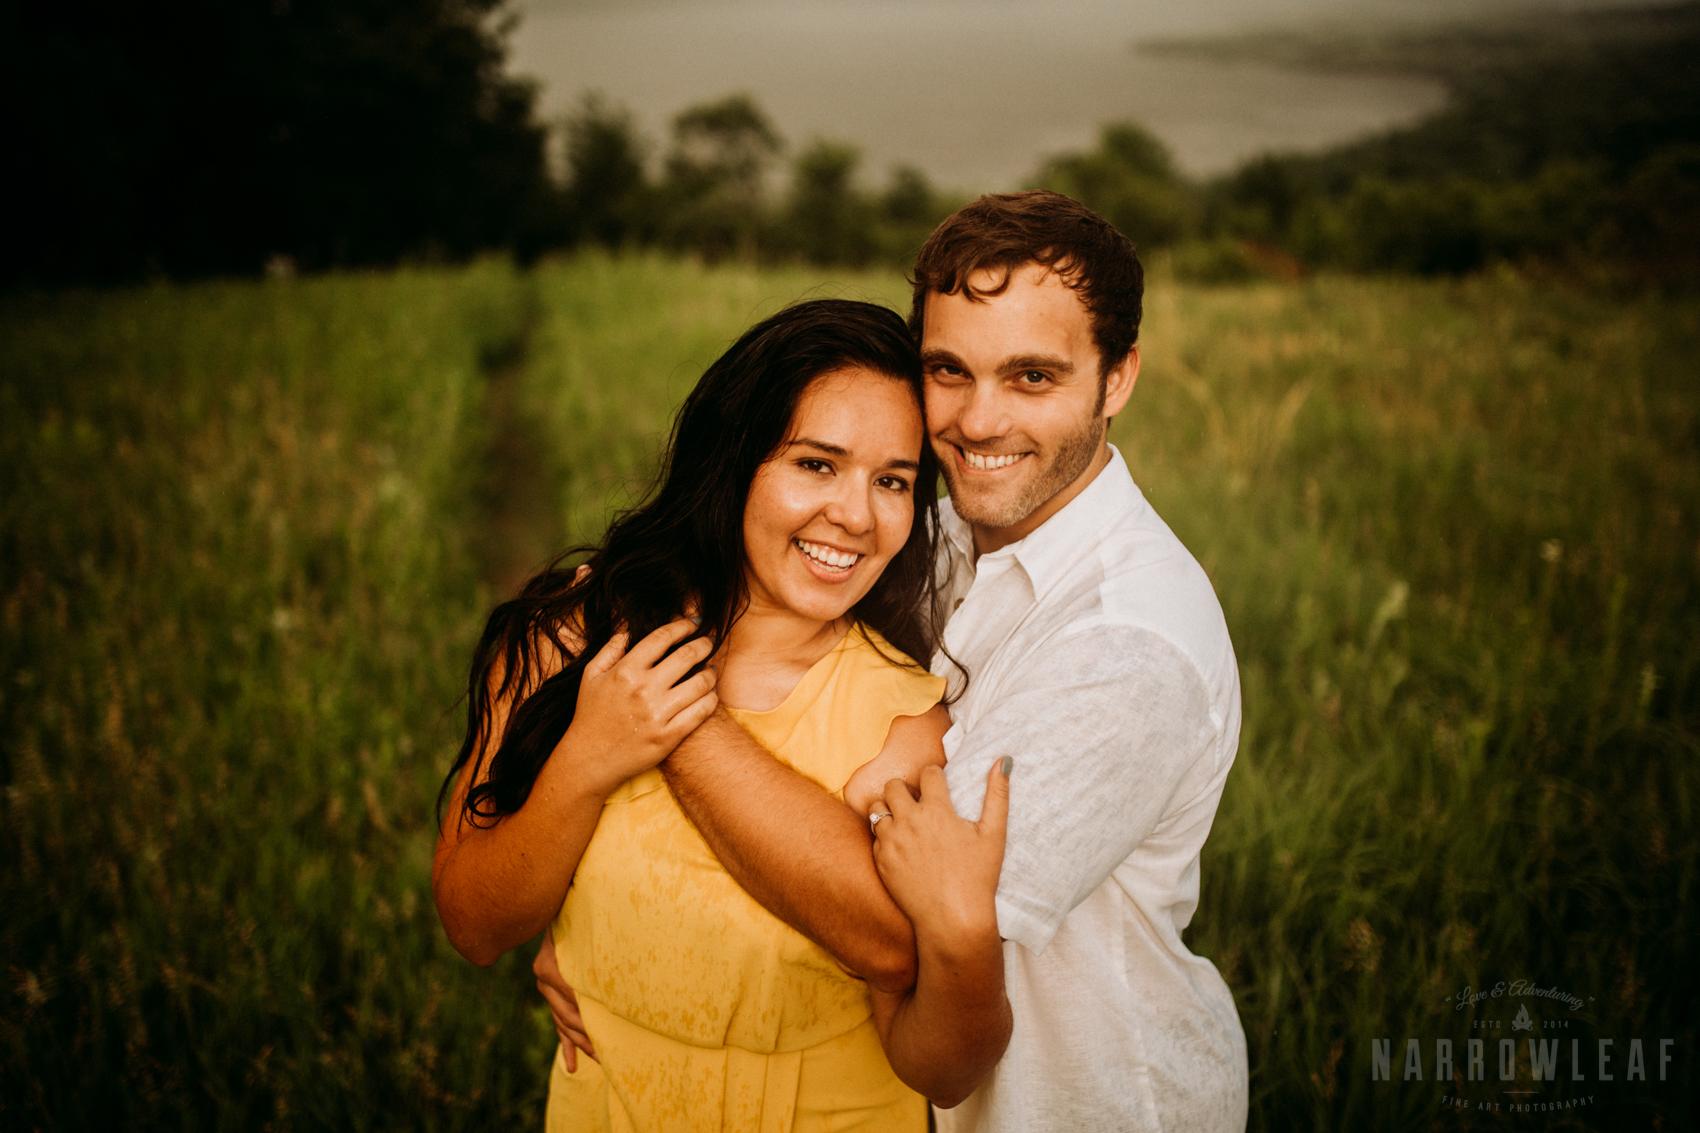 summer-engagement-photos-frontenac-mn-NarrowLeaf_Love_&_Adventure_Photography-39.jpg